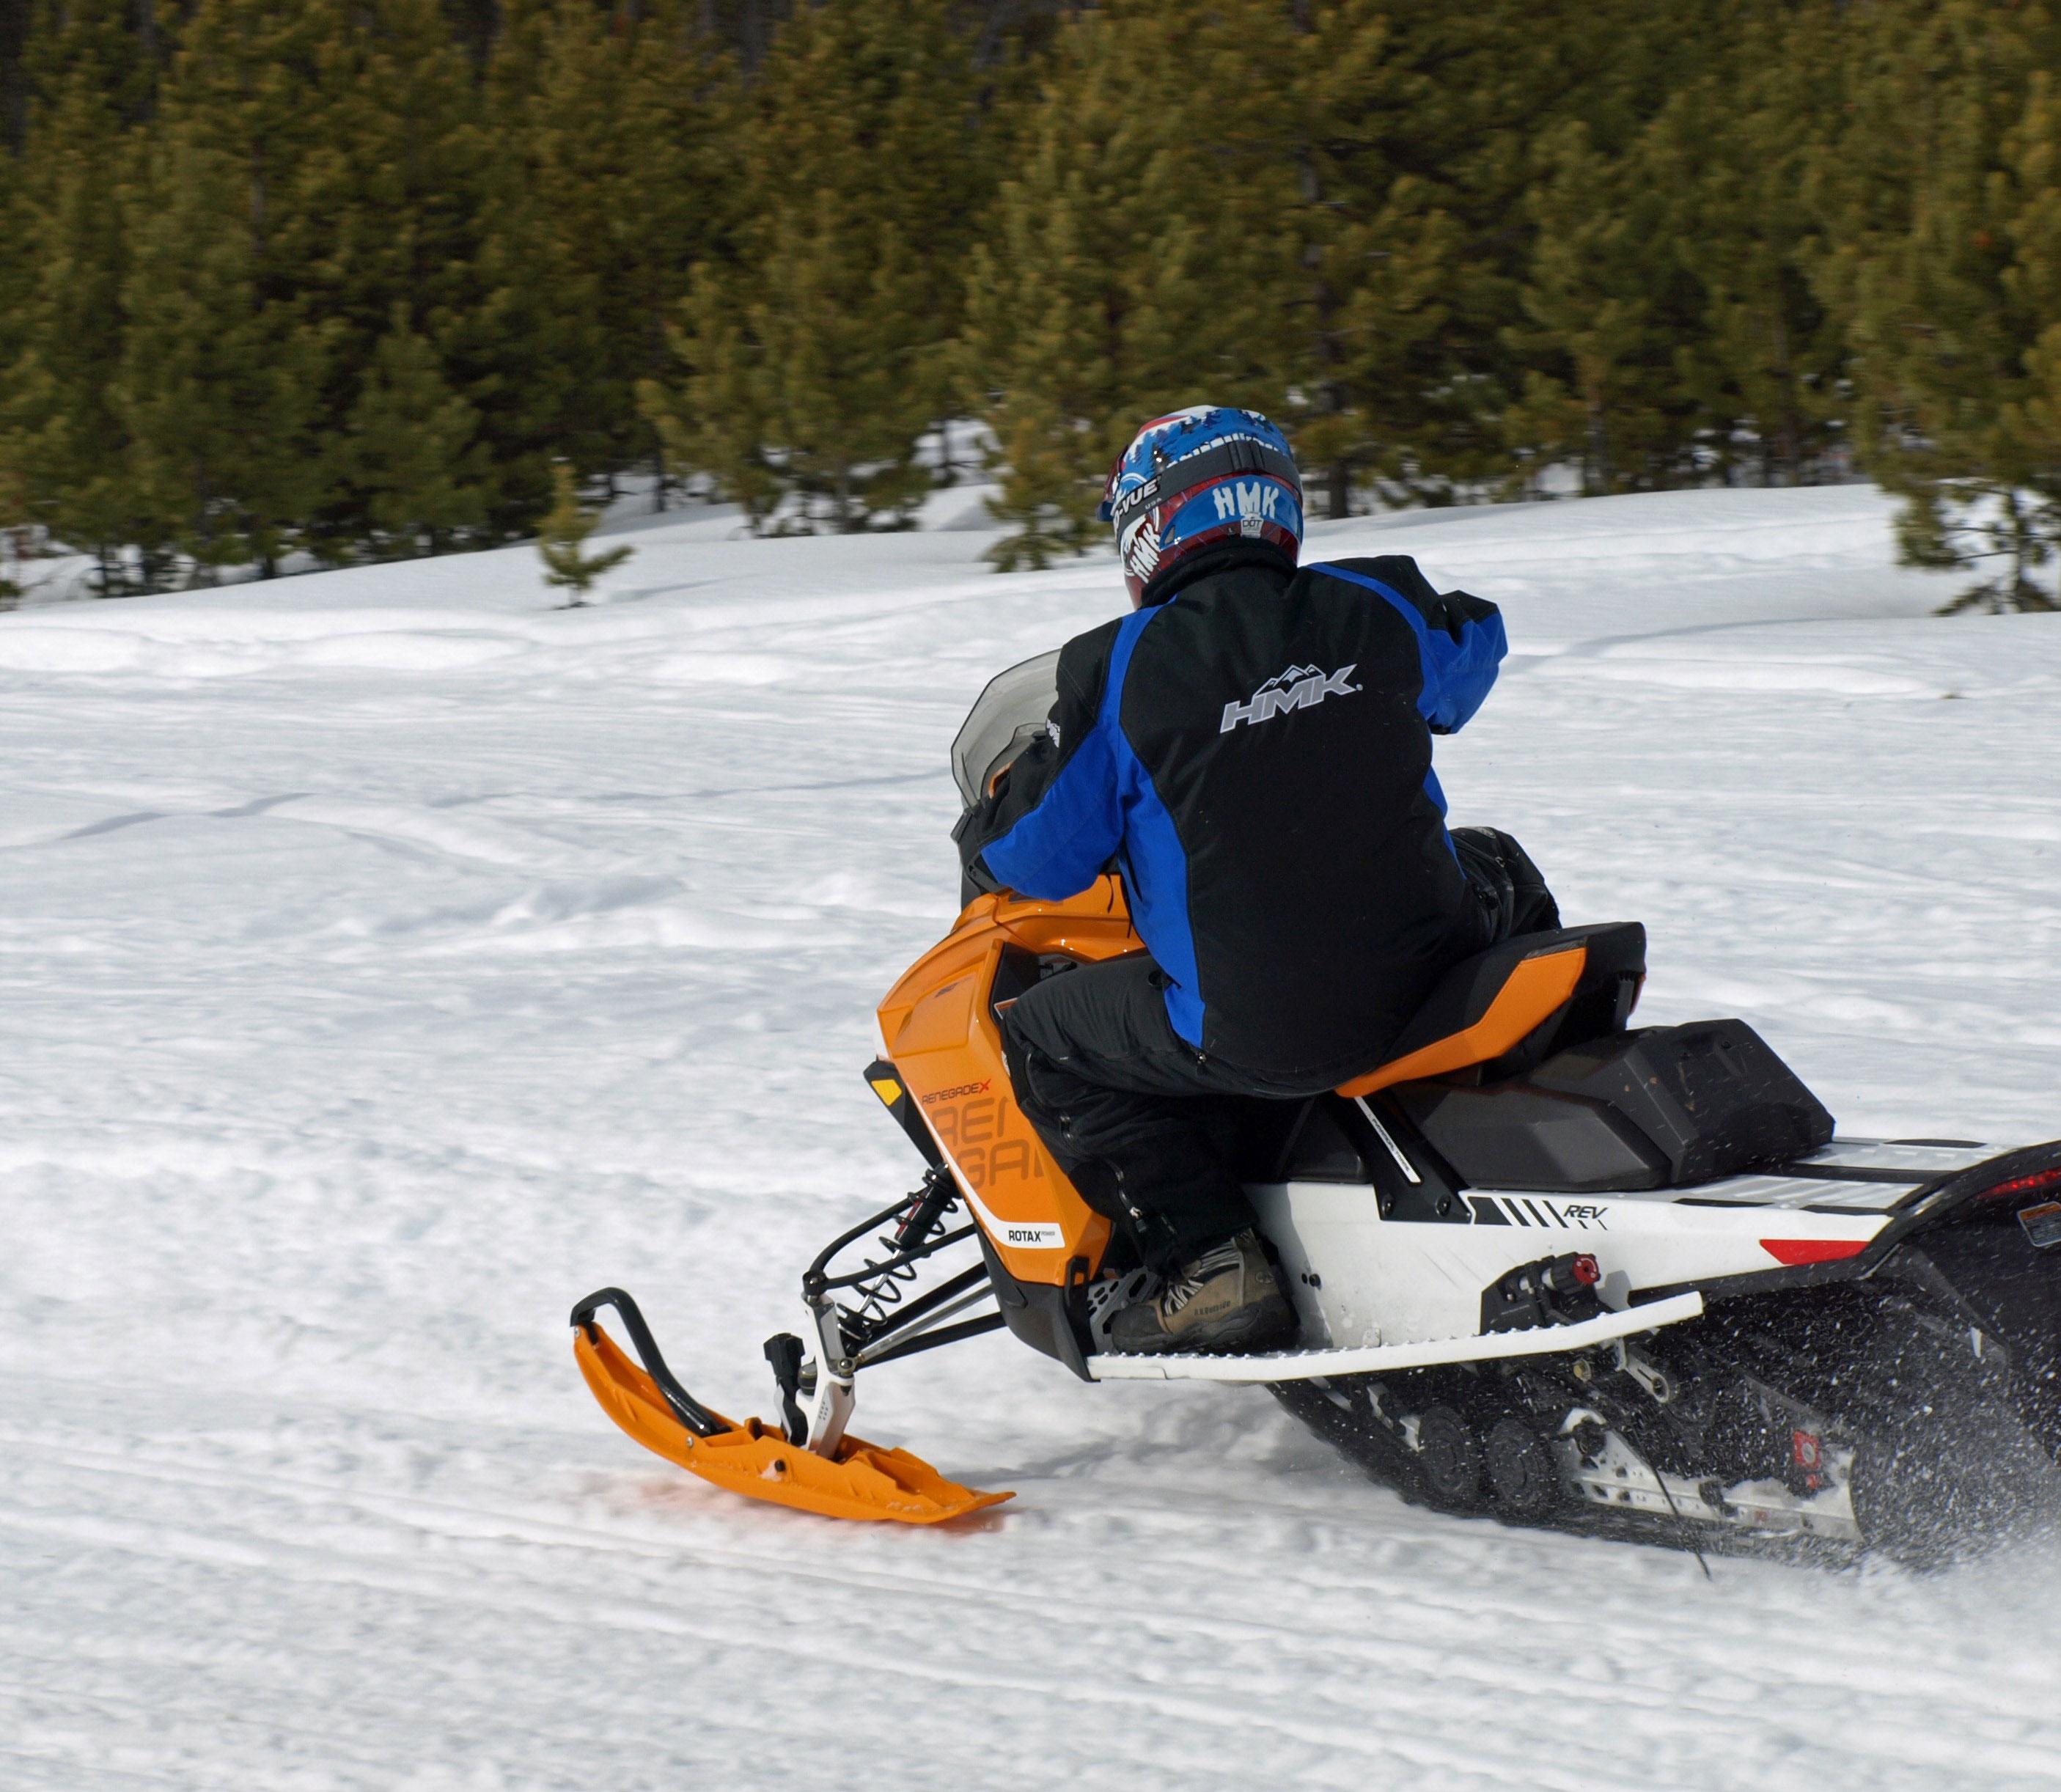 Impressions On The 2017 Ski Doo 850s And Yamaha Sidewinder